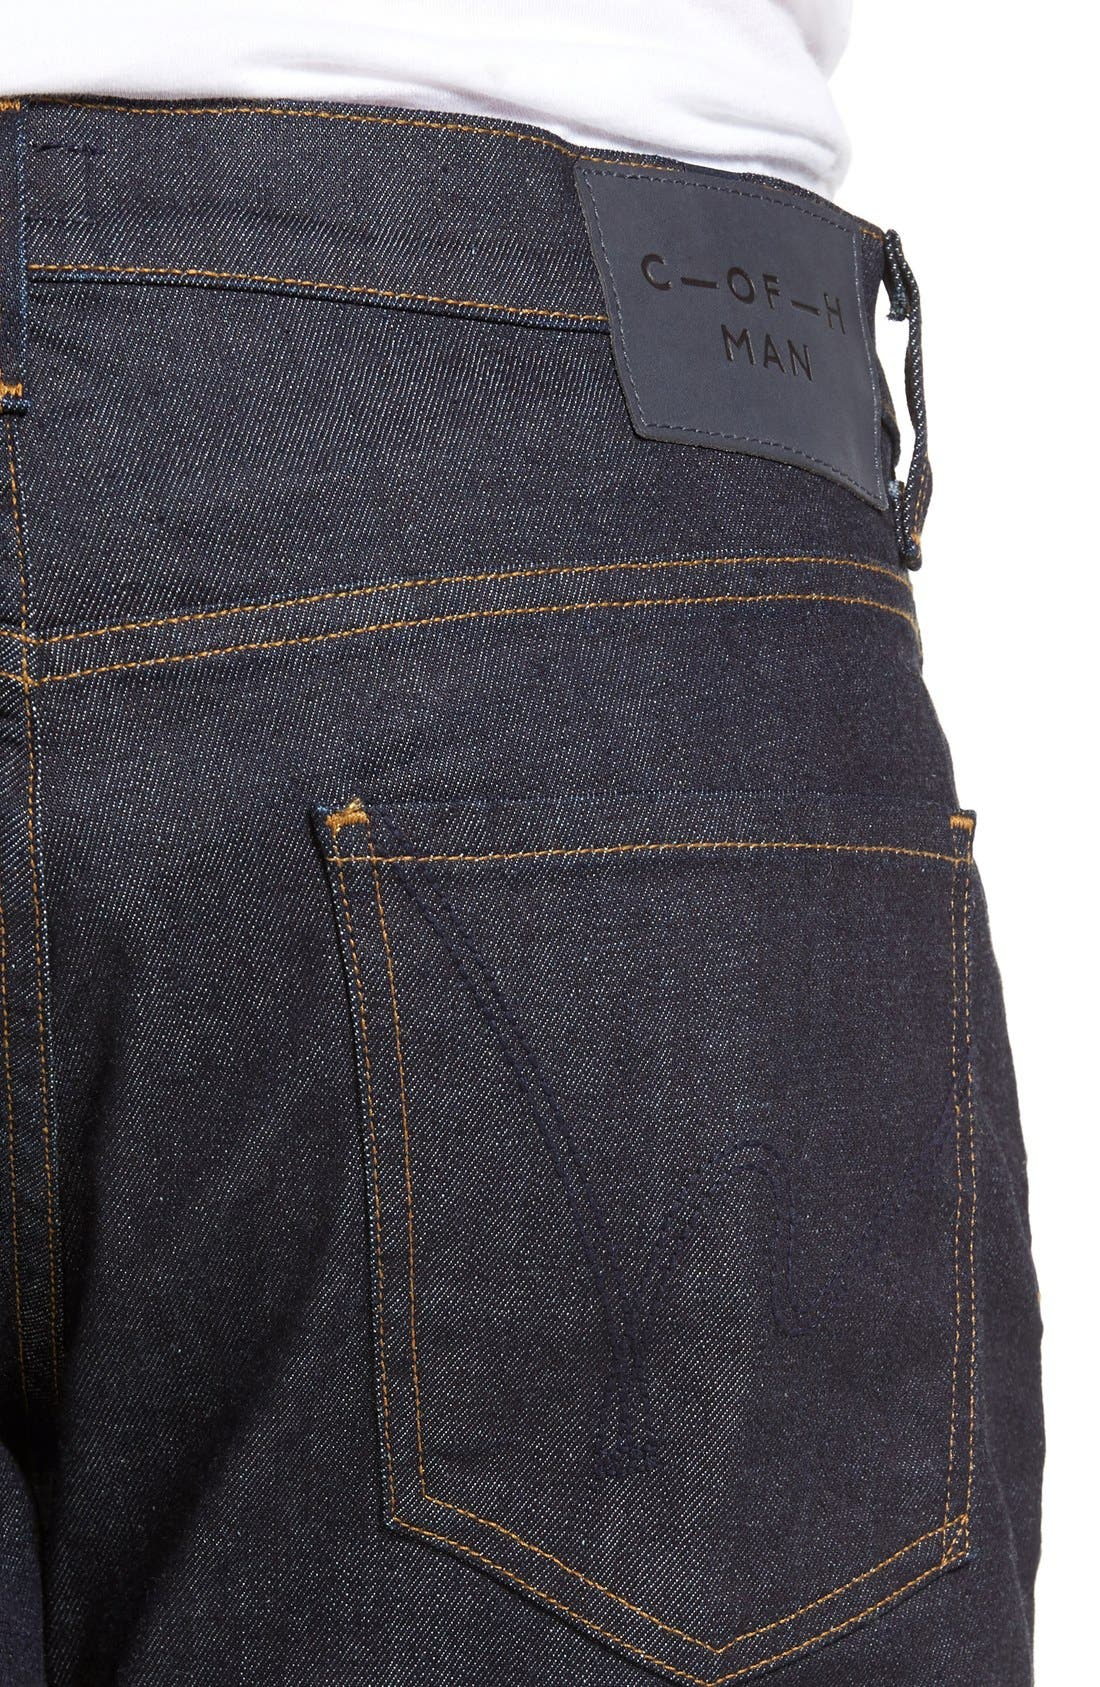 Sid Classic Straight Leg Jeans,                             Alternate thumbnail 10, color,                             LAFAYETTE